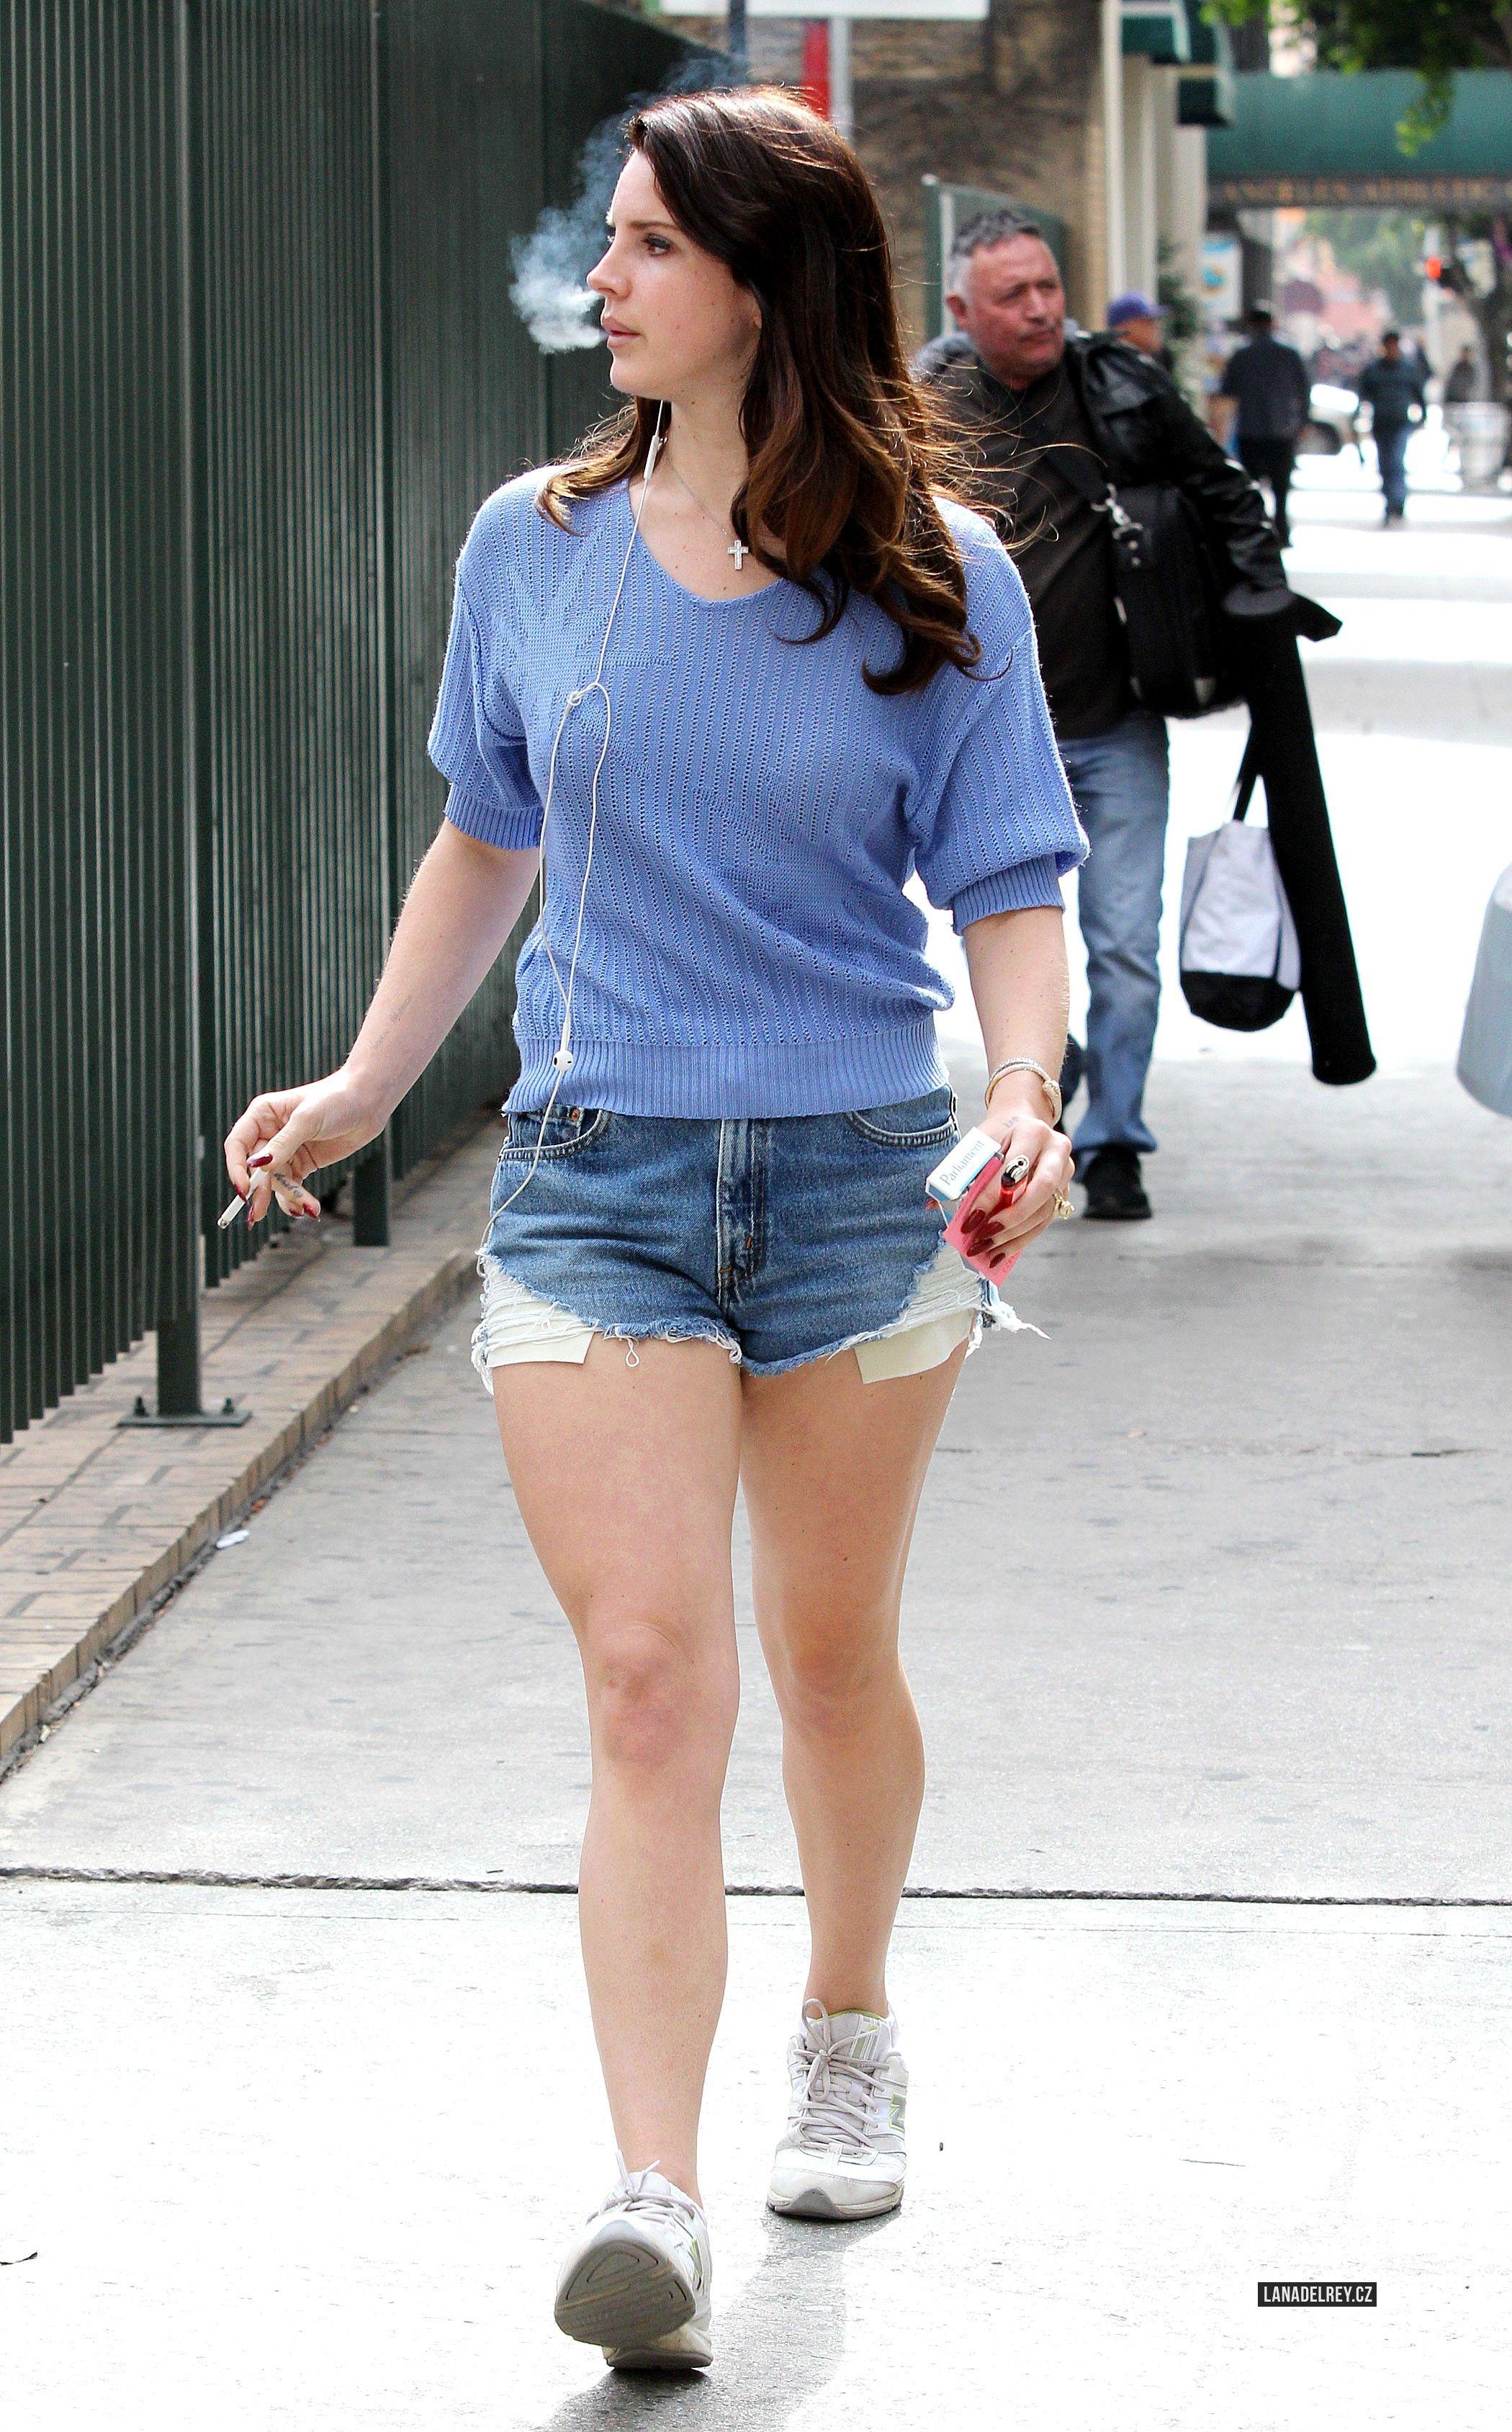 Lana in Los Angeles (Feb. 26, 2014)